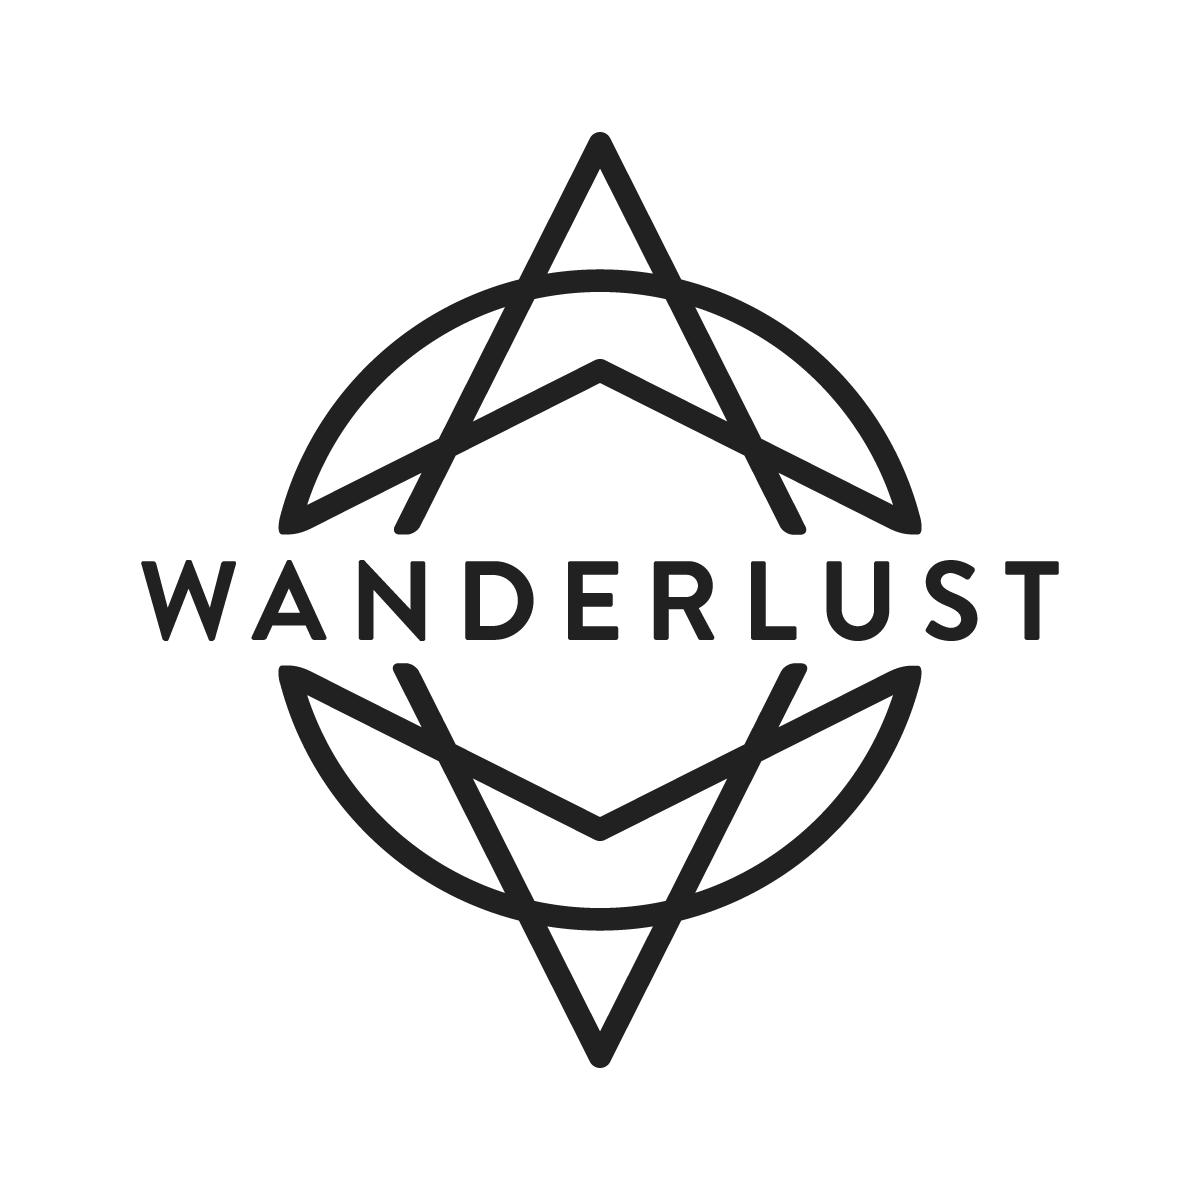 Wanderlust logo. Debby Siegel teaches at Wanderlust in 2018.